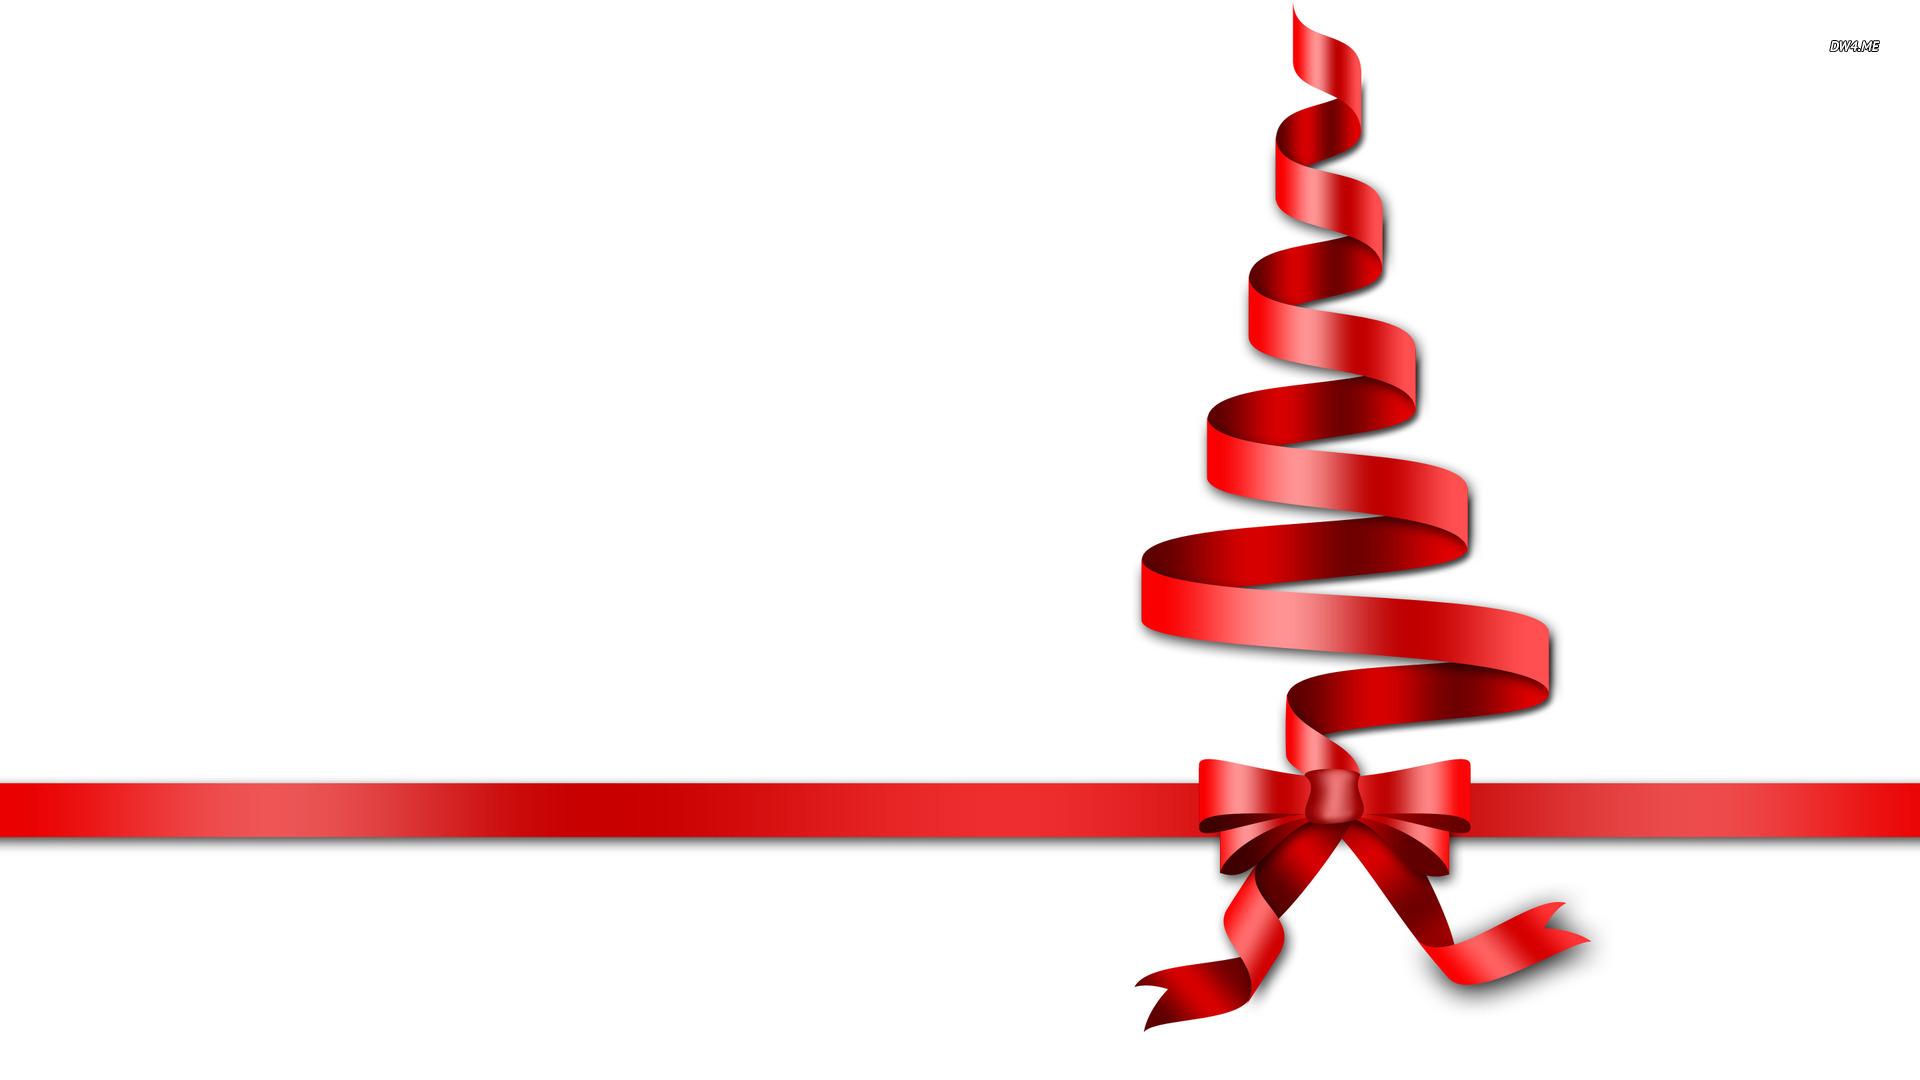 http://www.marvelslane.lewisham.sch.uk/mlps/wp-content/uploads/2015/11/1969-ribbon-christmas-tree-1920x1080-holiday-wallpaper.jpg